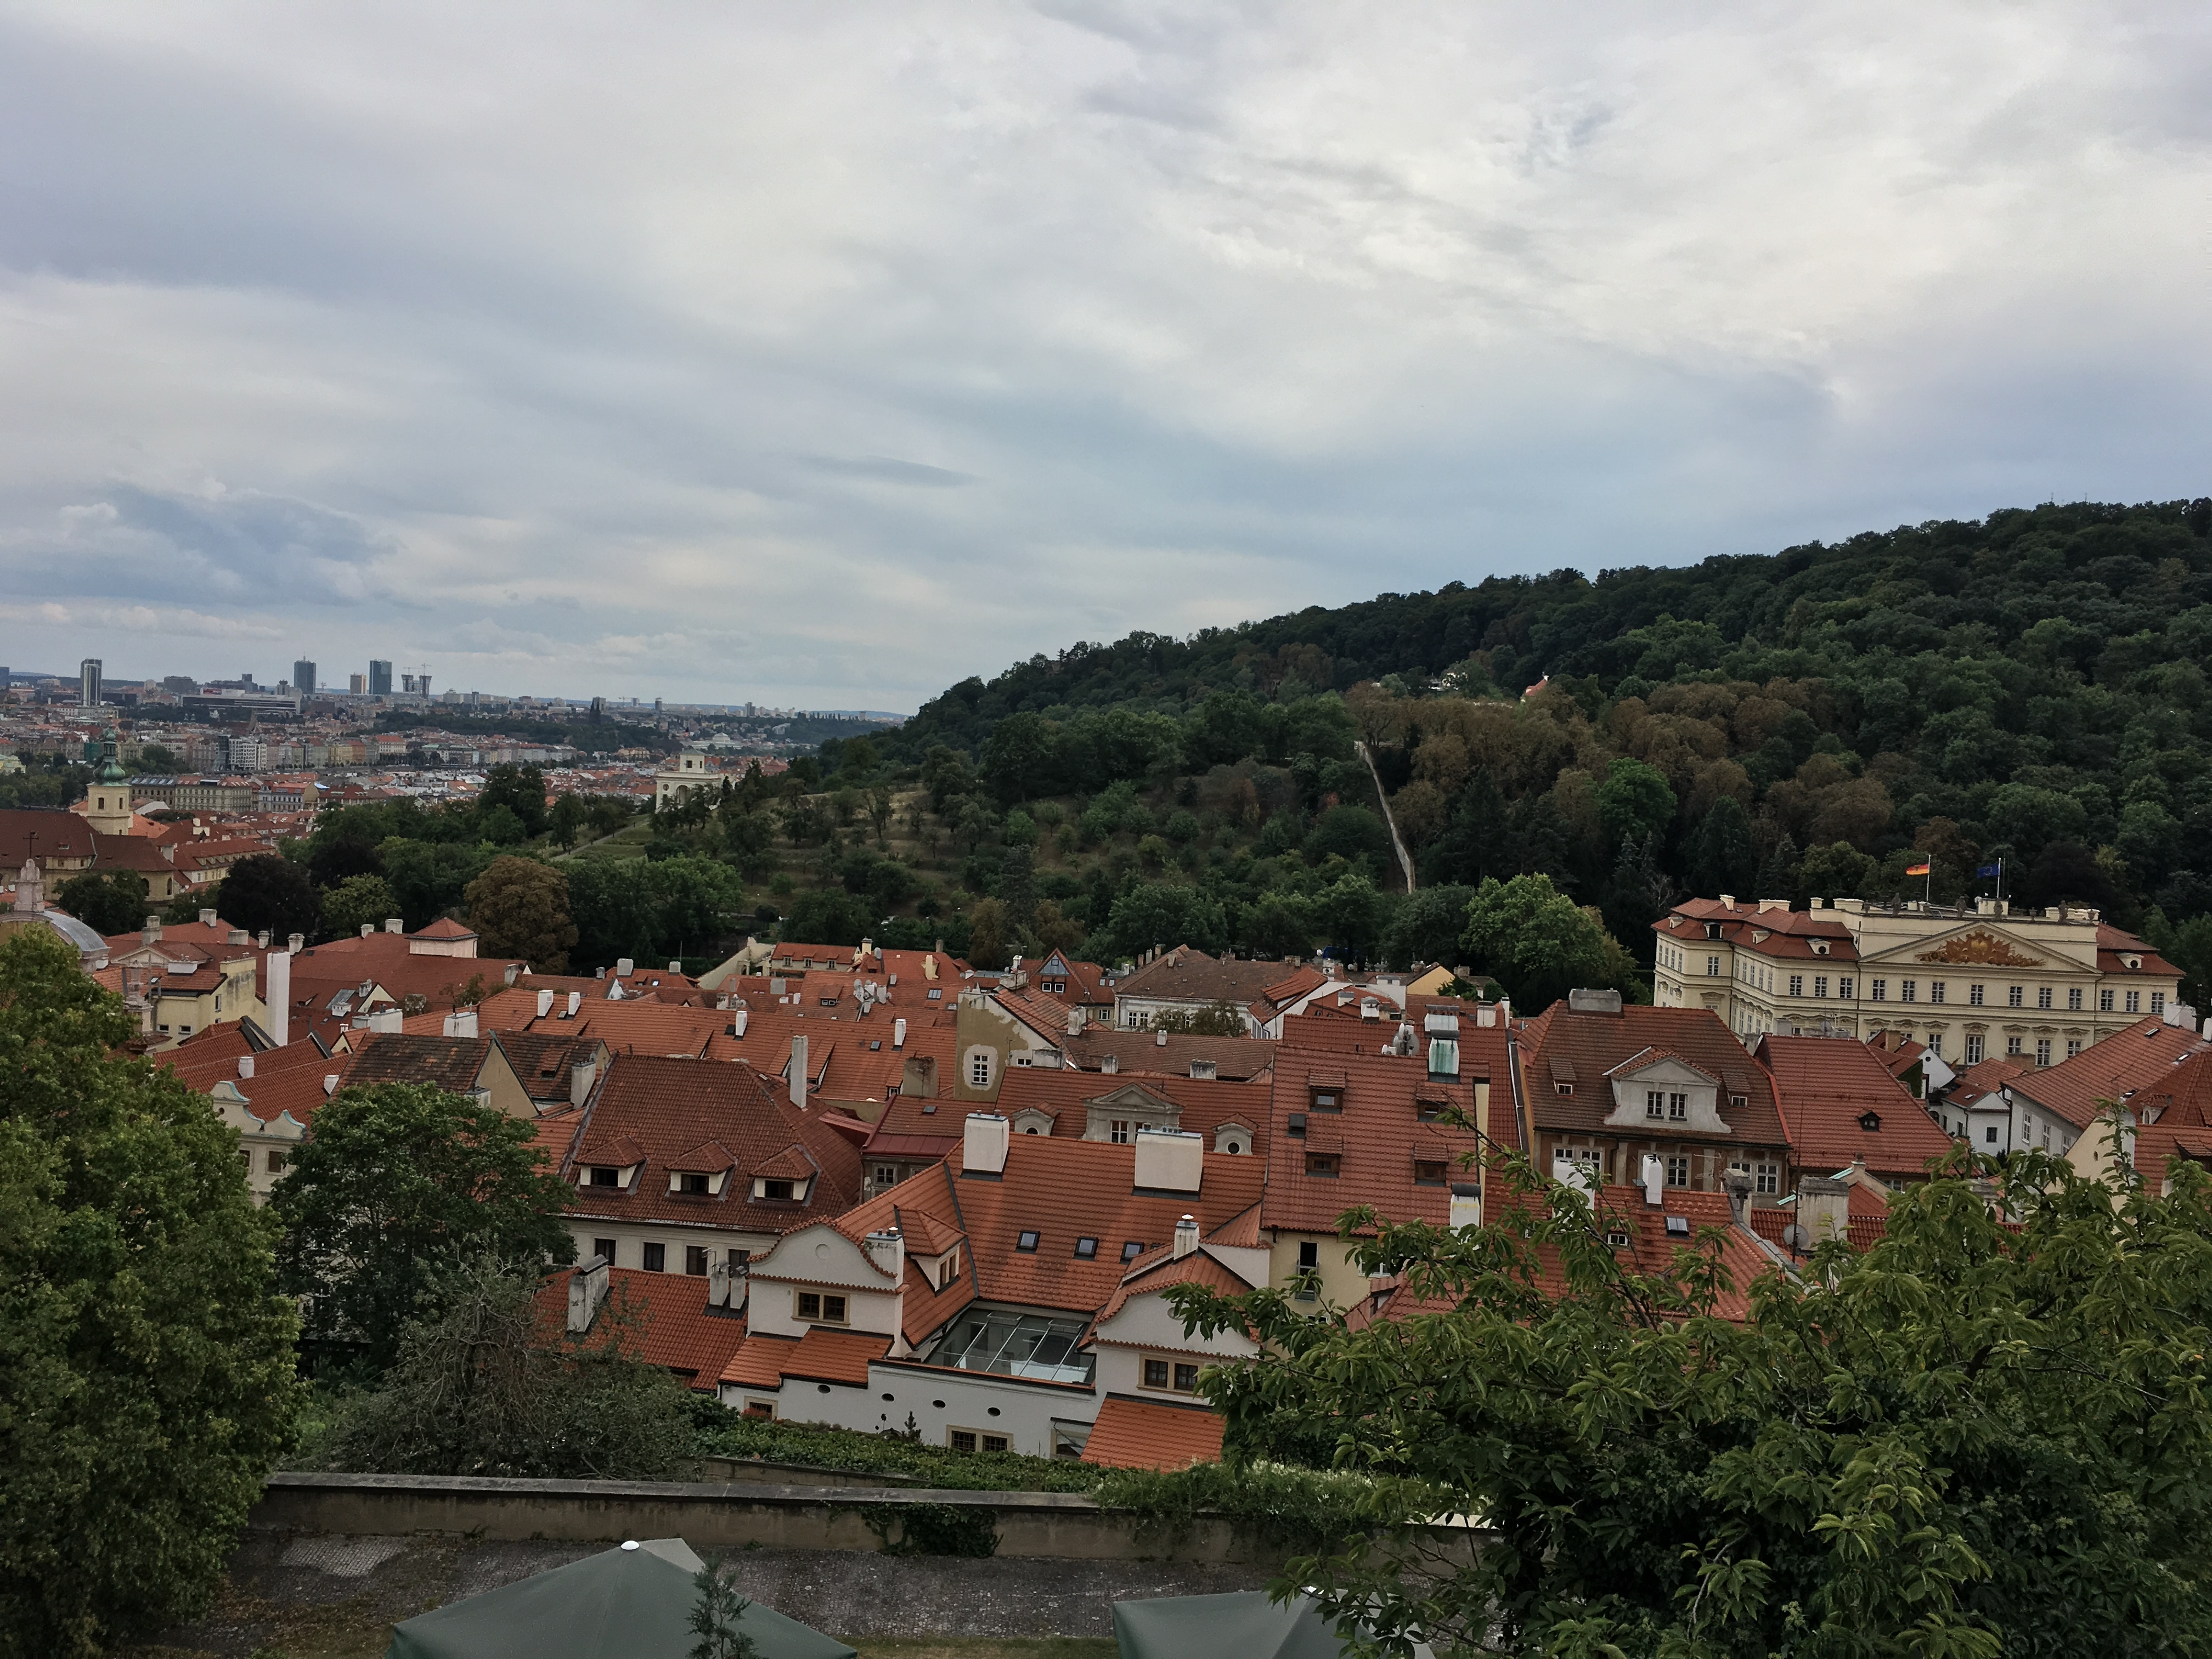 [Travel] Mein erstes Mal – Prag